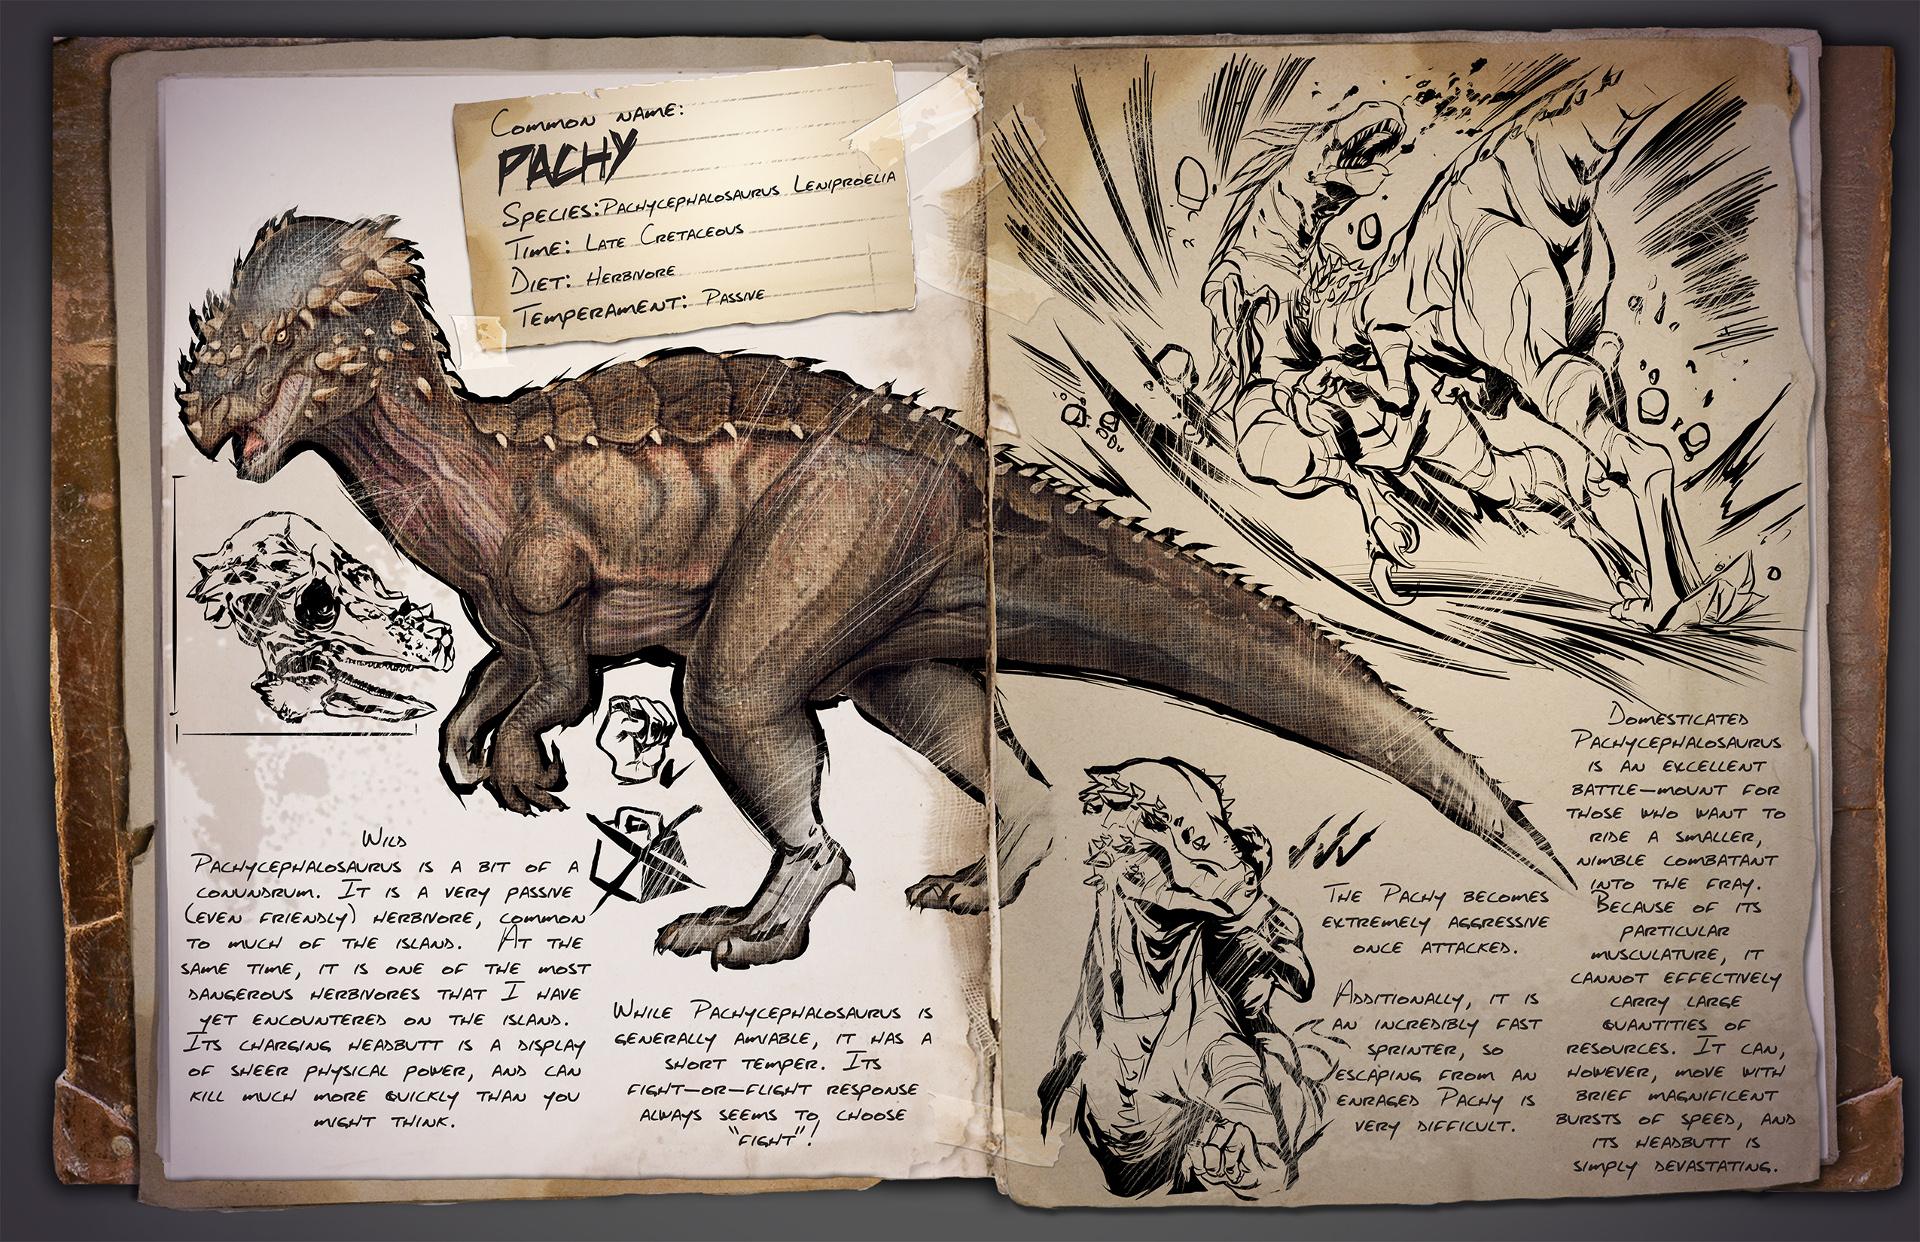 Dino Dossier: Pachycephalosaurus aka Pachy